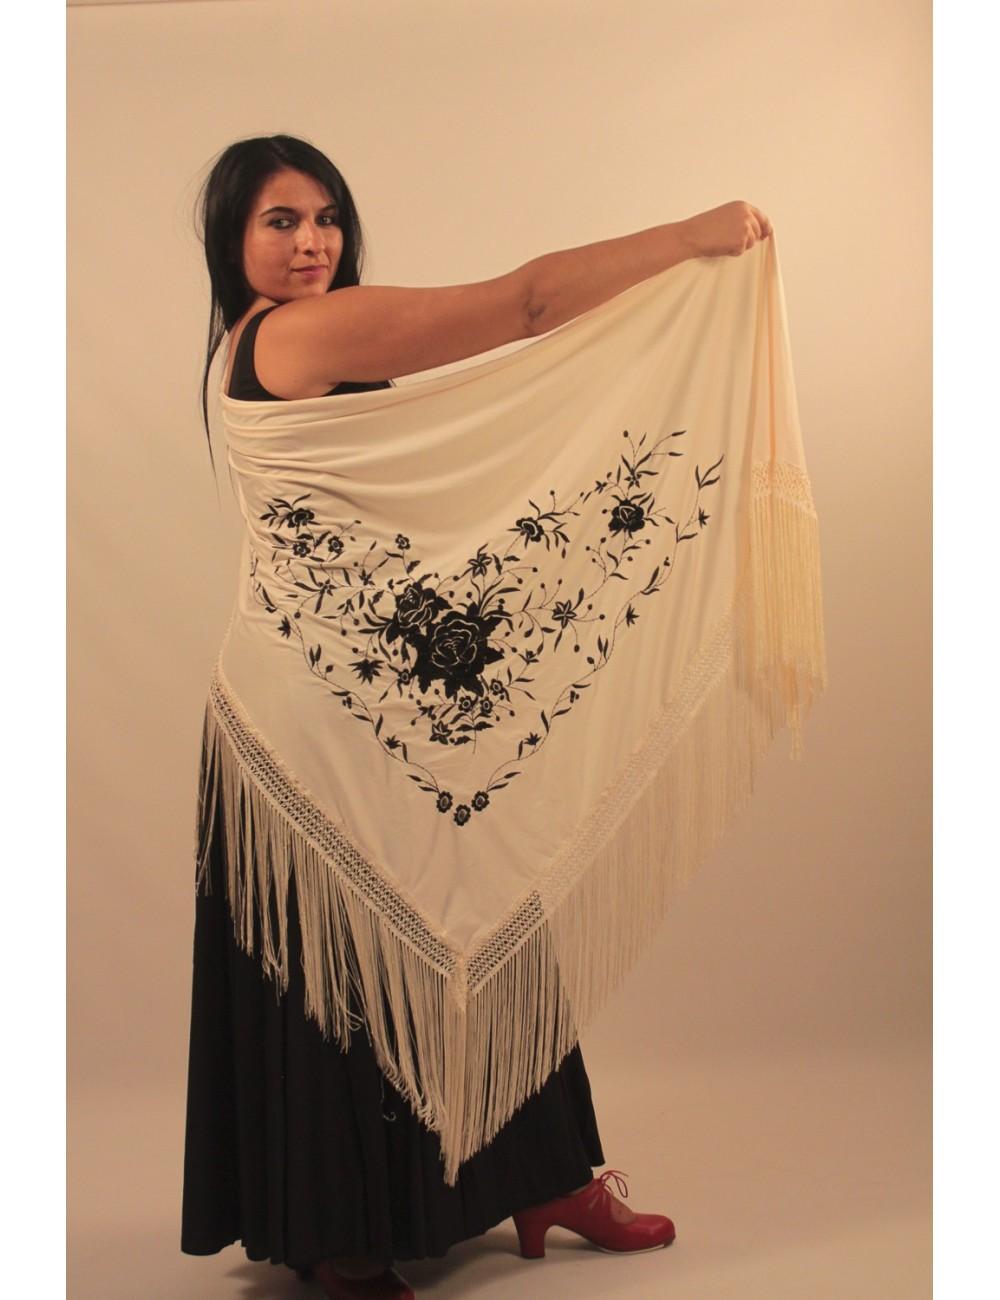 Grand châle flamenco beige brodé noir